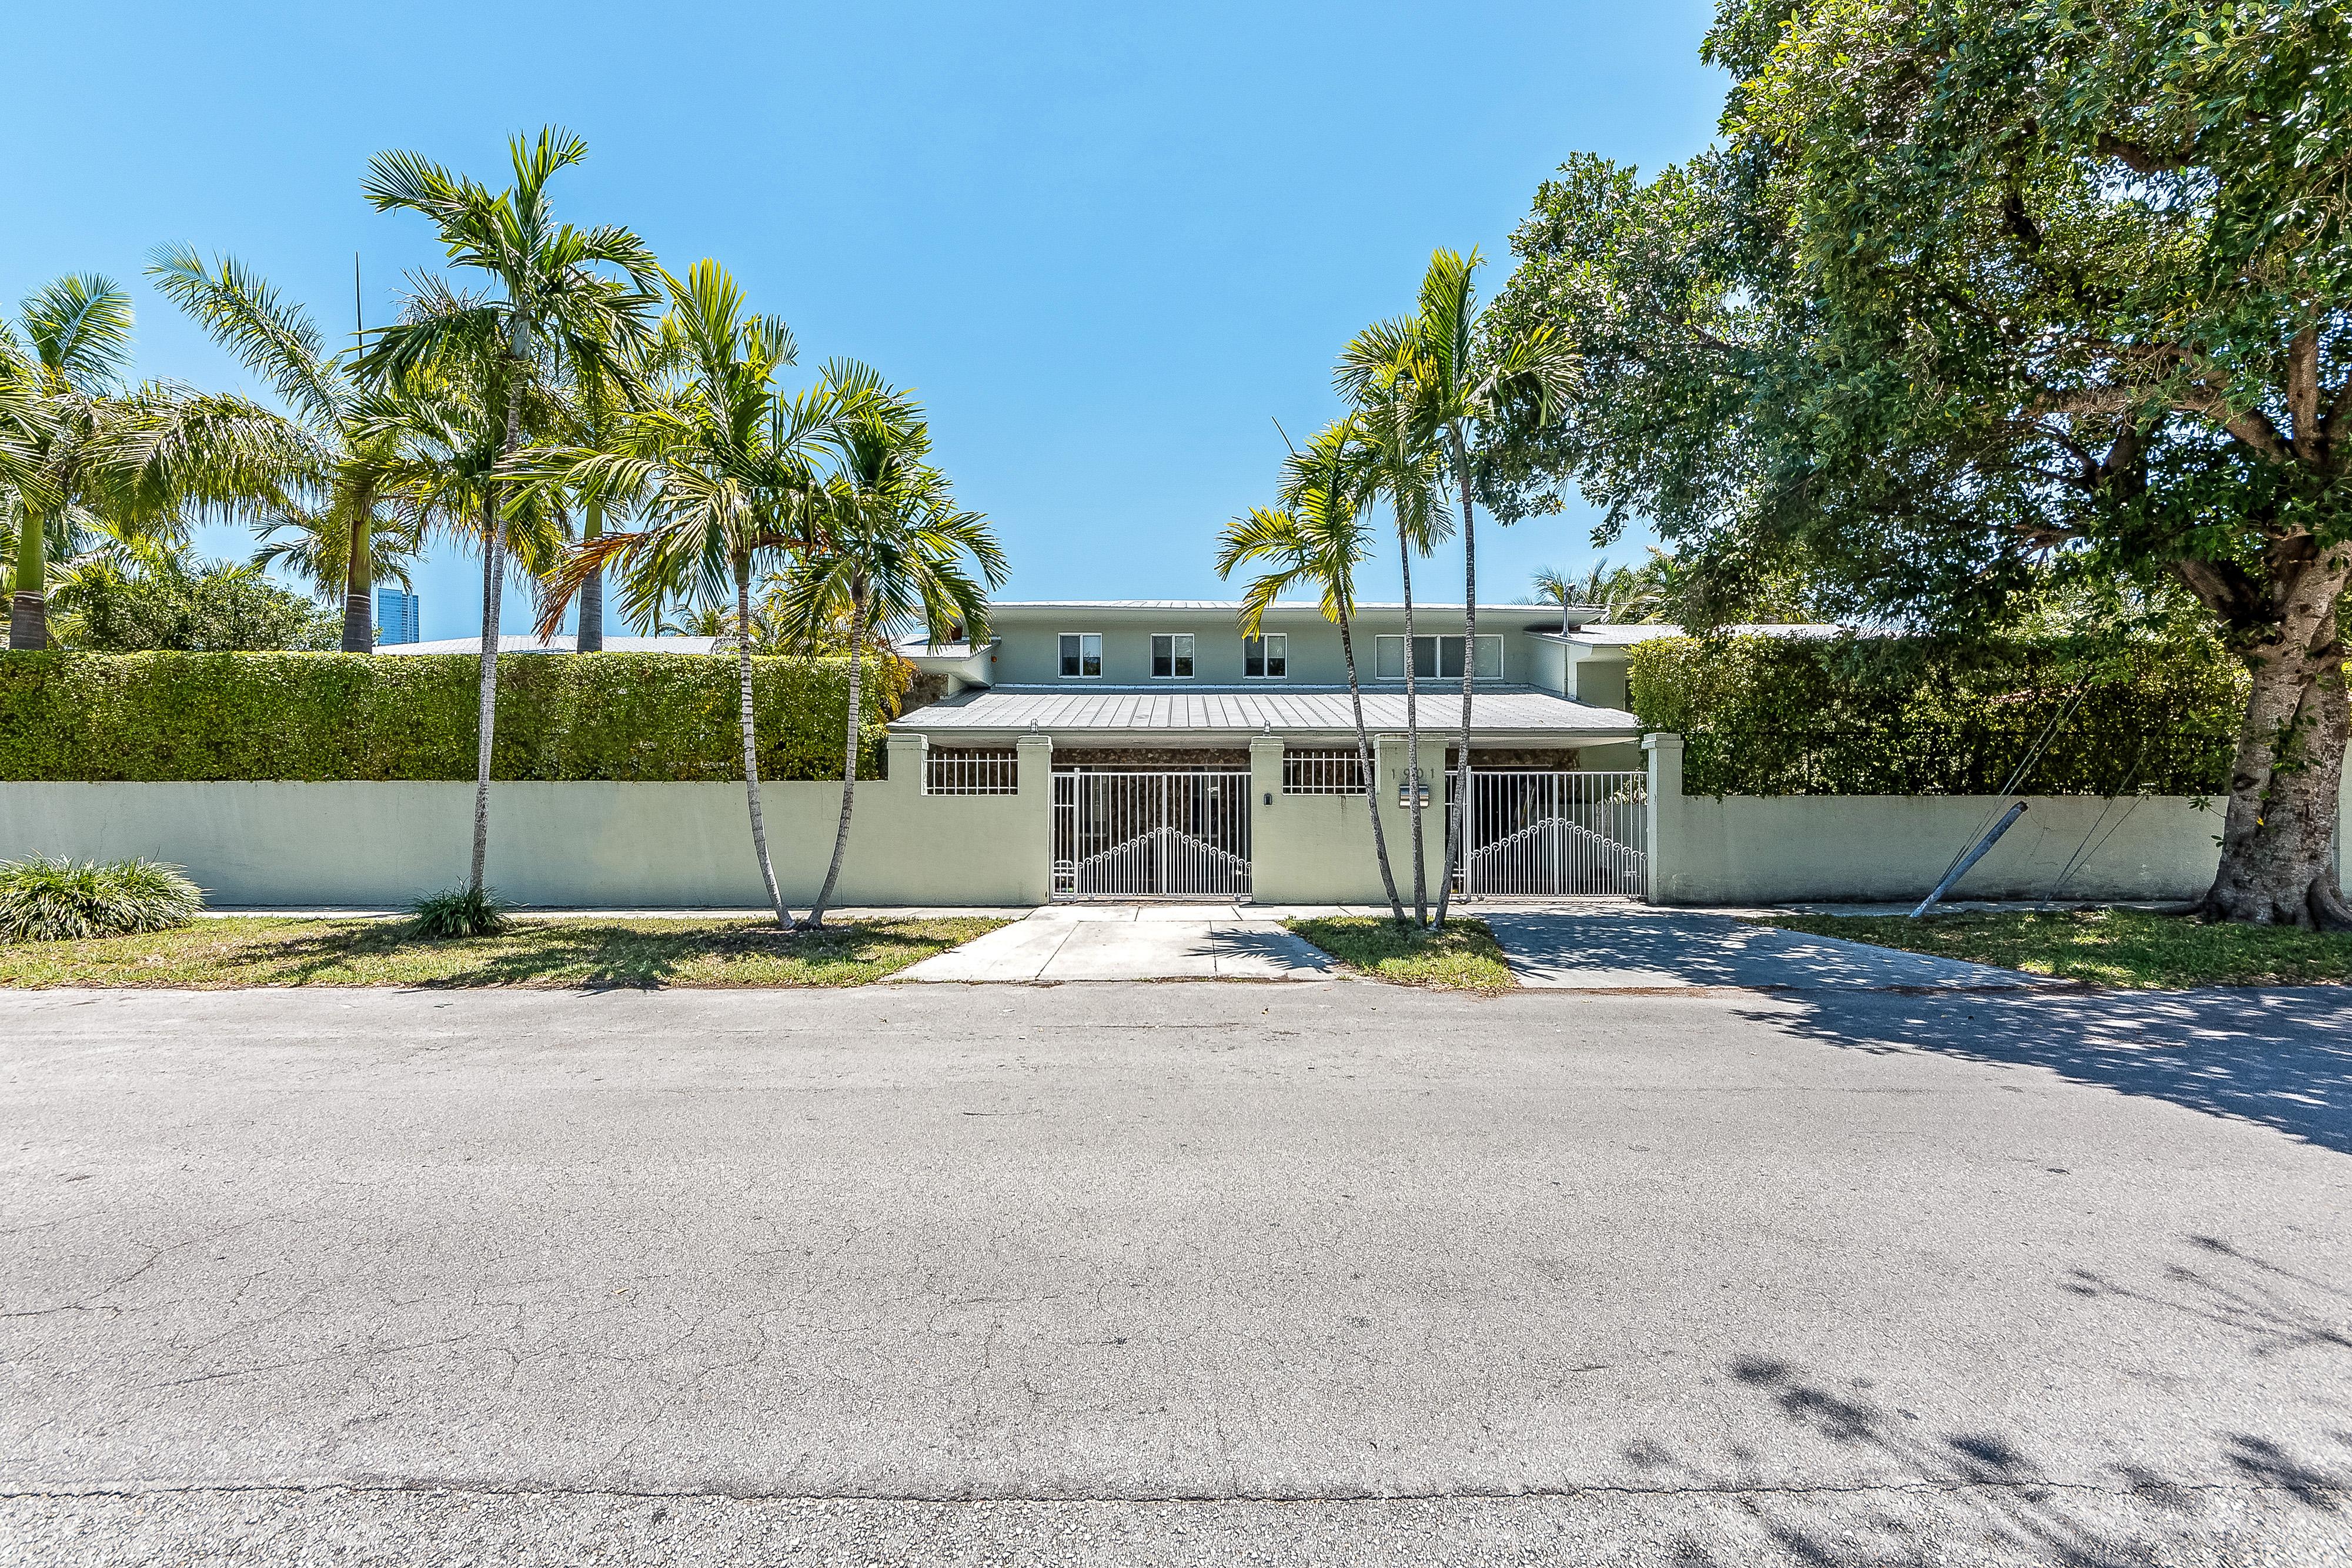 Single Family Home for Sale at 1901 Sw 5 Avenue Miami, Florida, 33129 United States